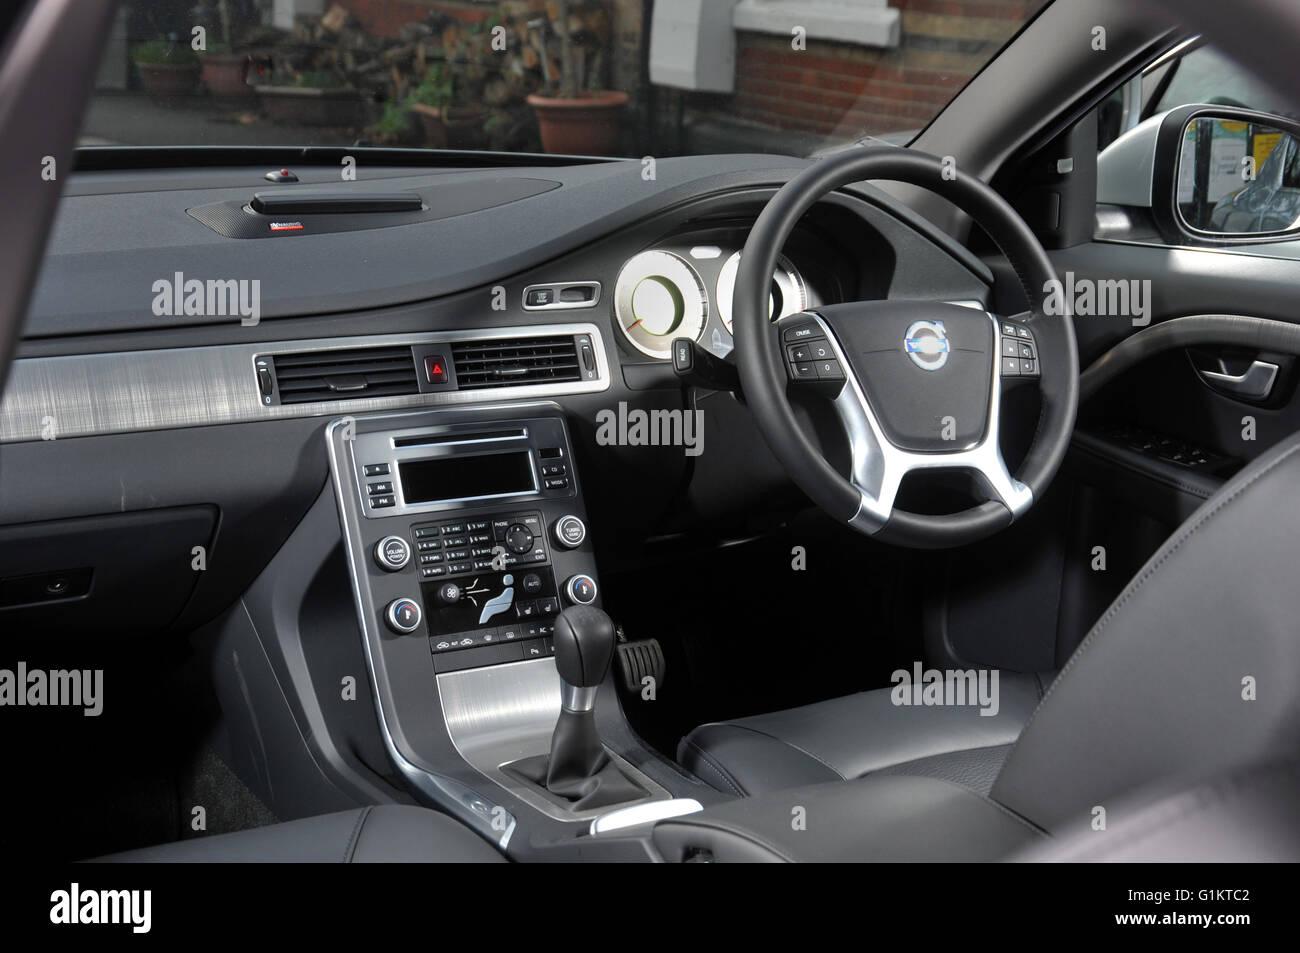 2009 Volvo S80 Premium Saloon Sedan Car Interior Stock Photo Alamy